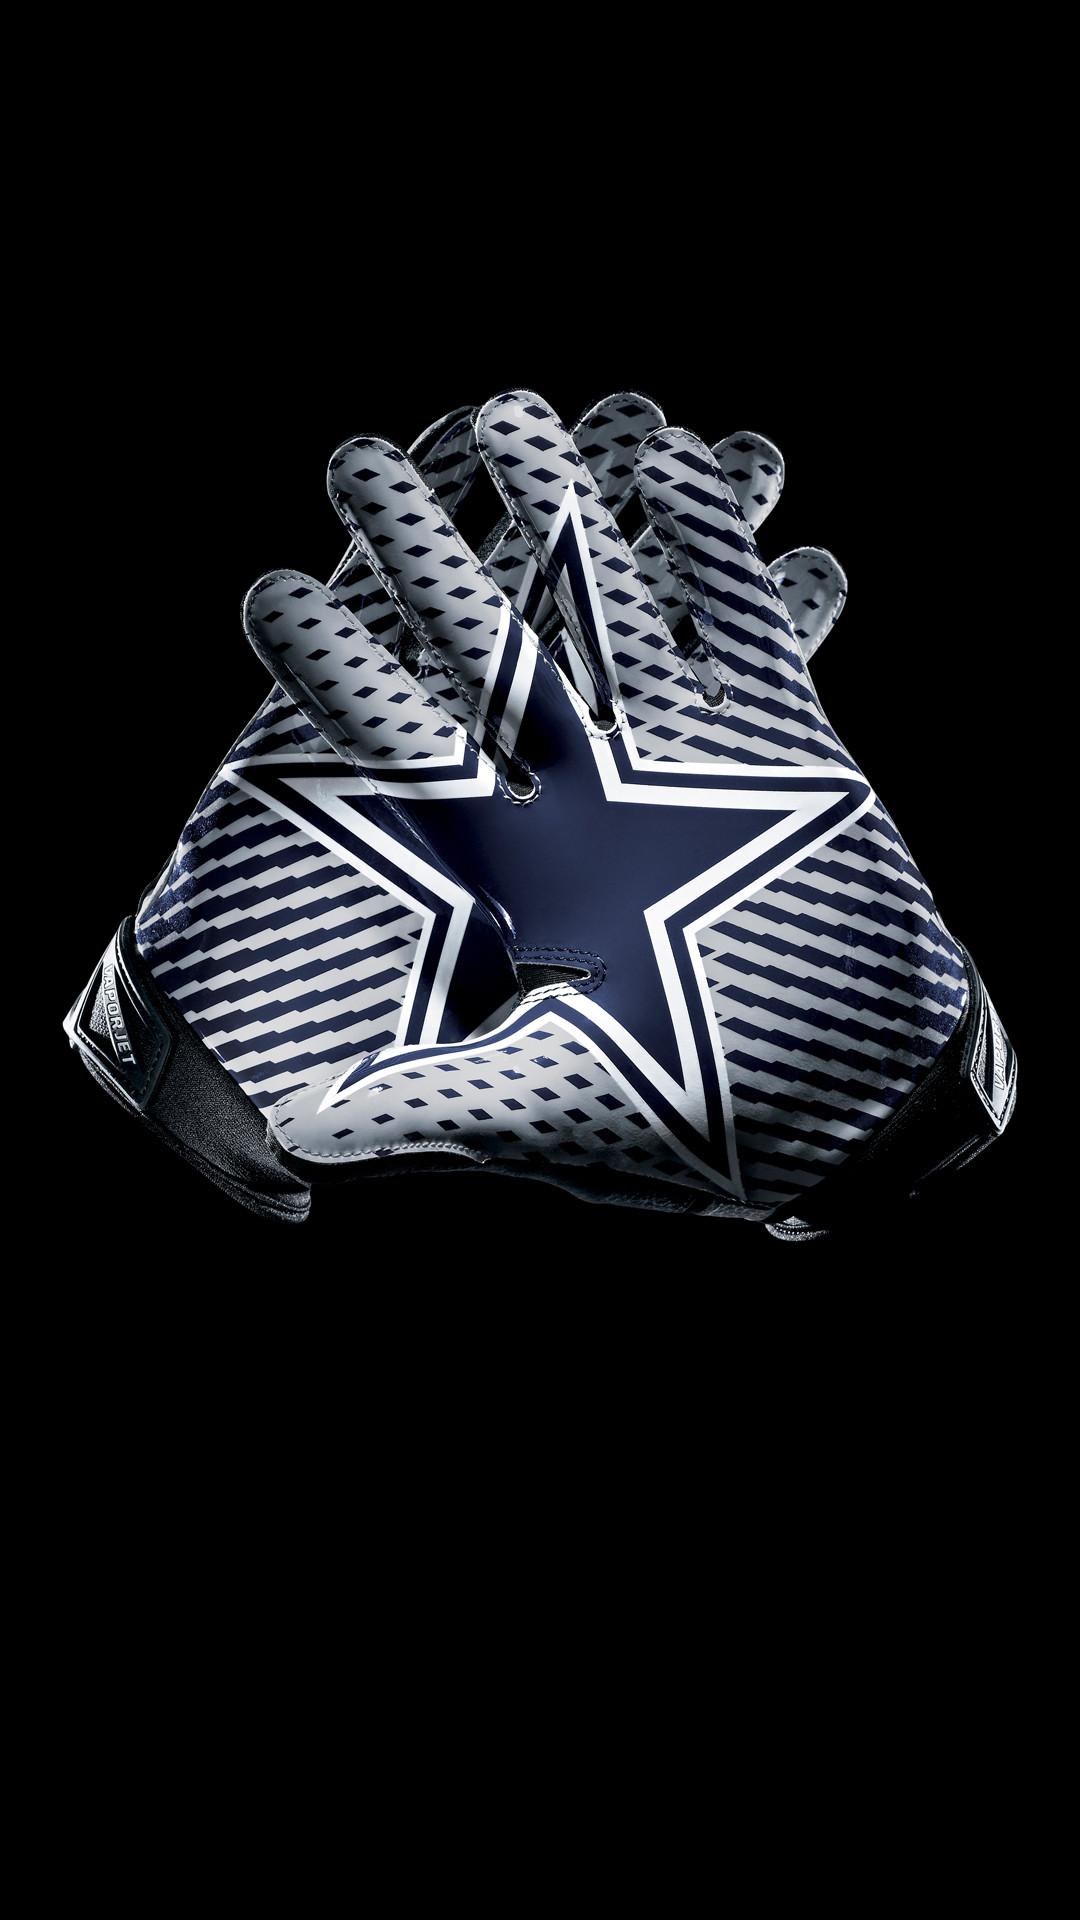 Dallas Cowboys Phone Wallpaper 63 Images